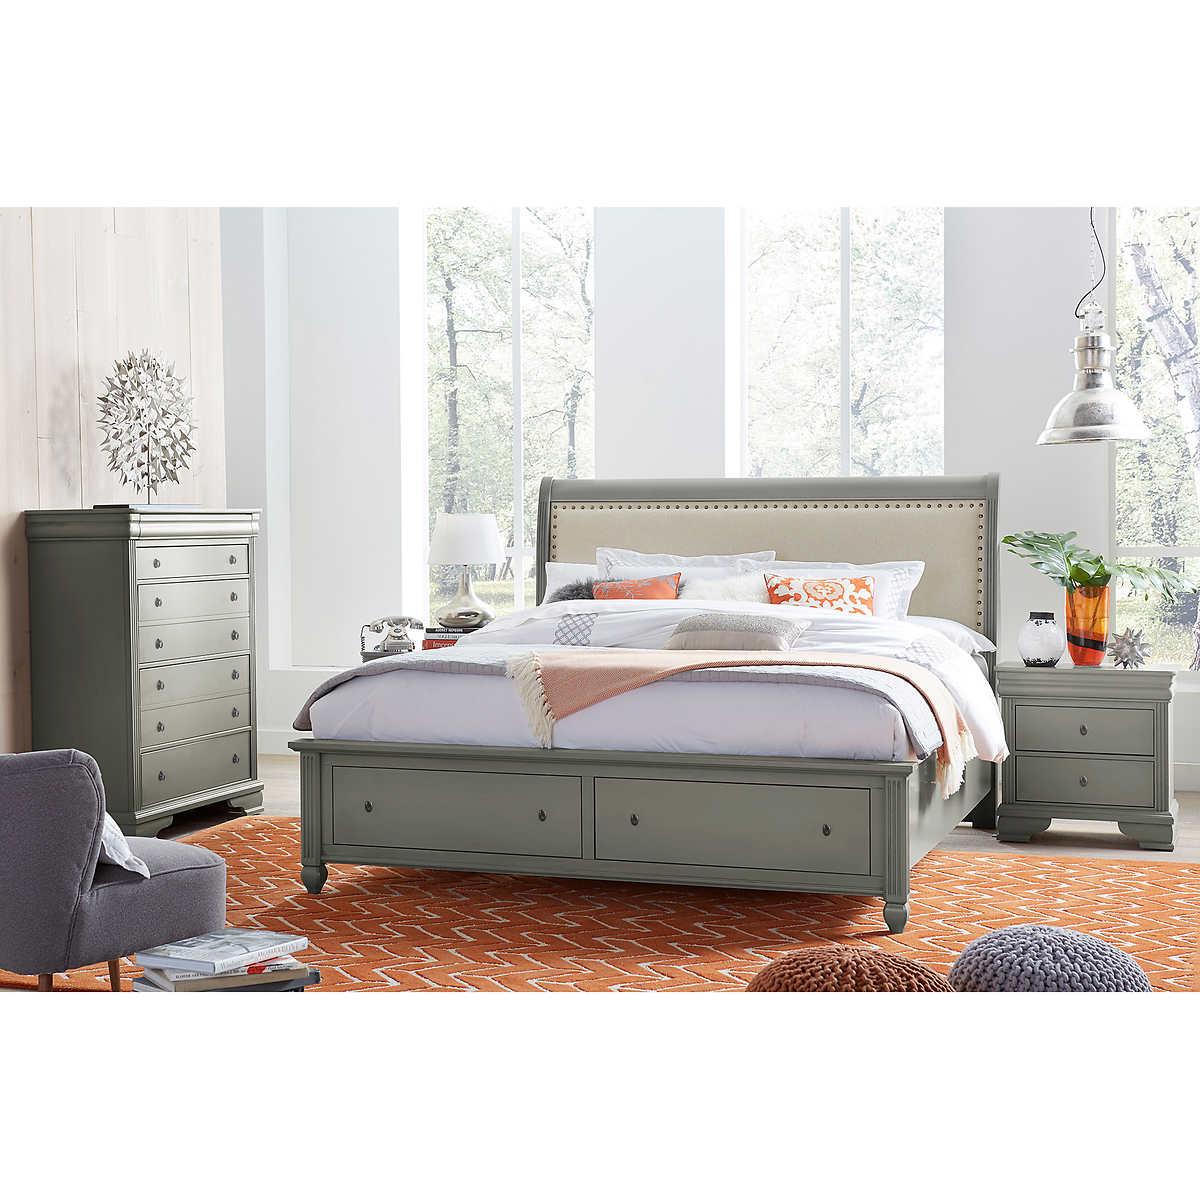 Carlisle 4-piece King Storage Bedroom Set